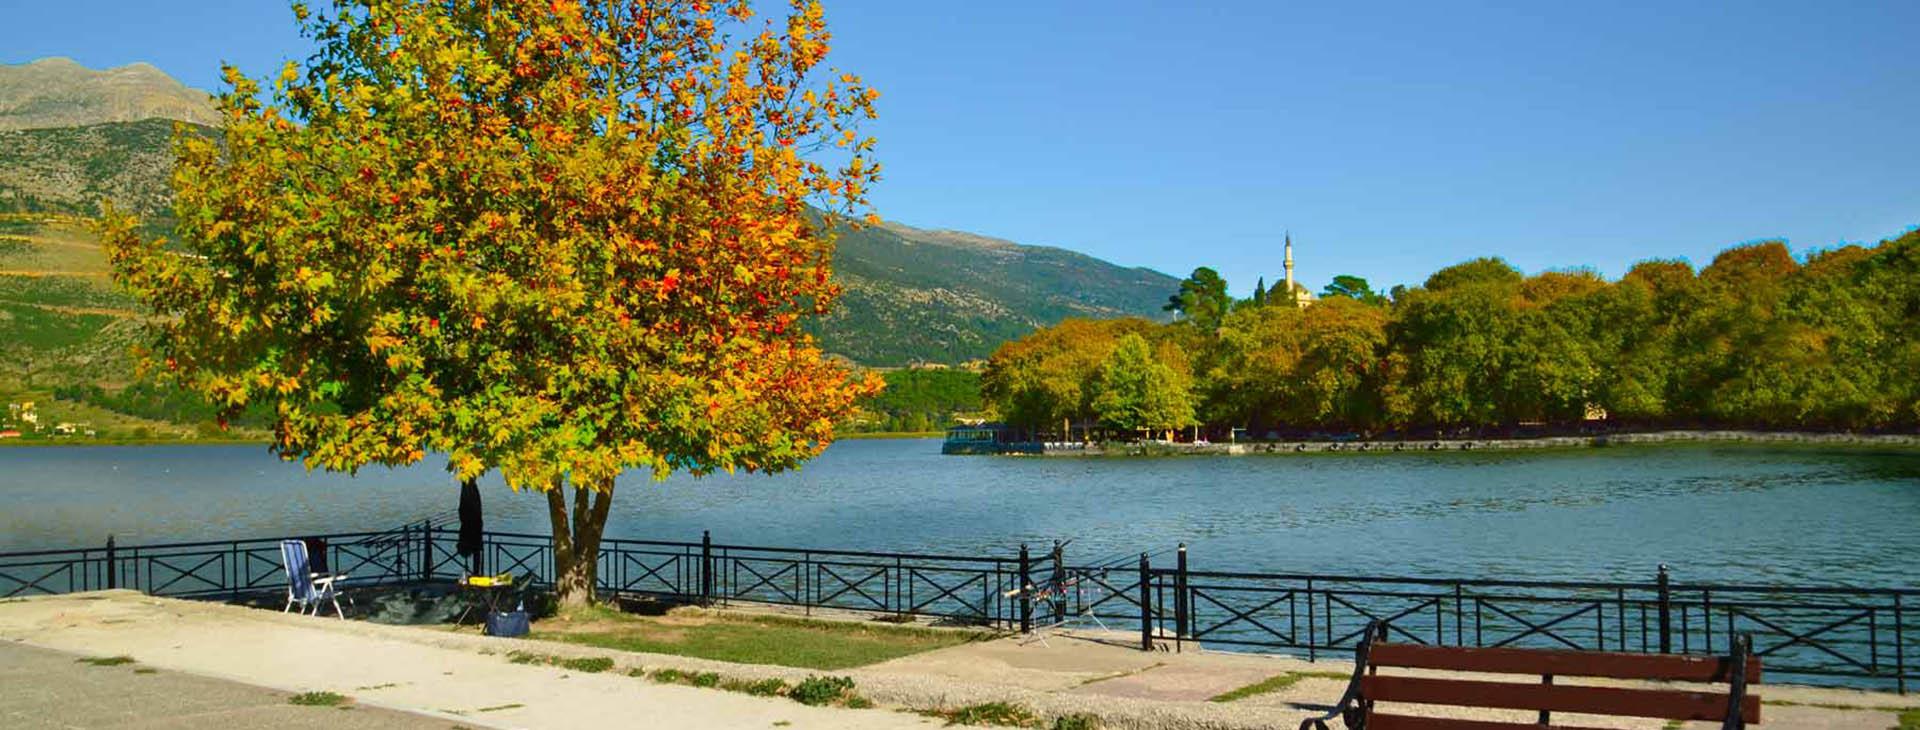 Pamvòtis lake, Ioannina city